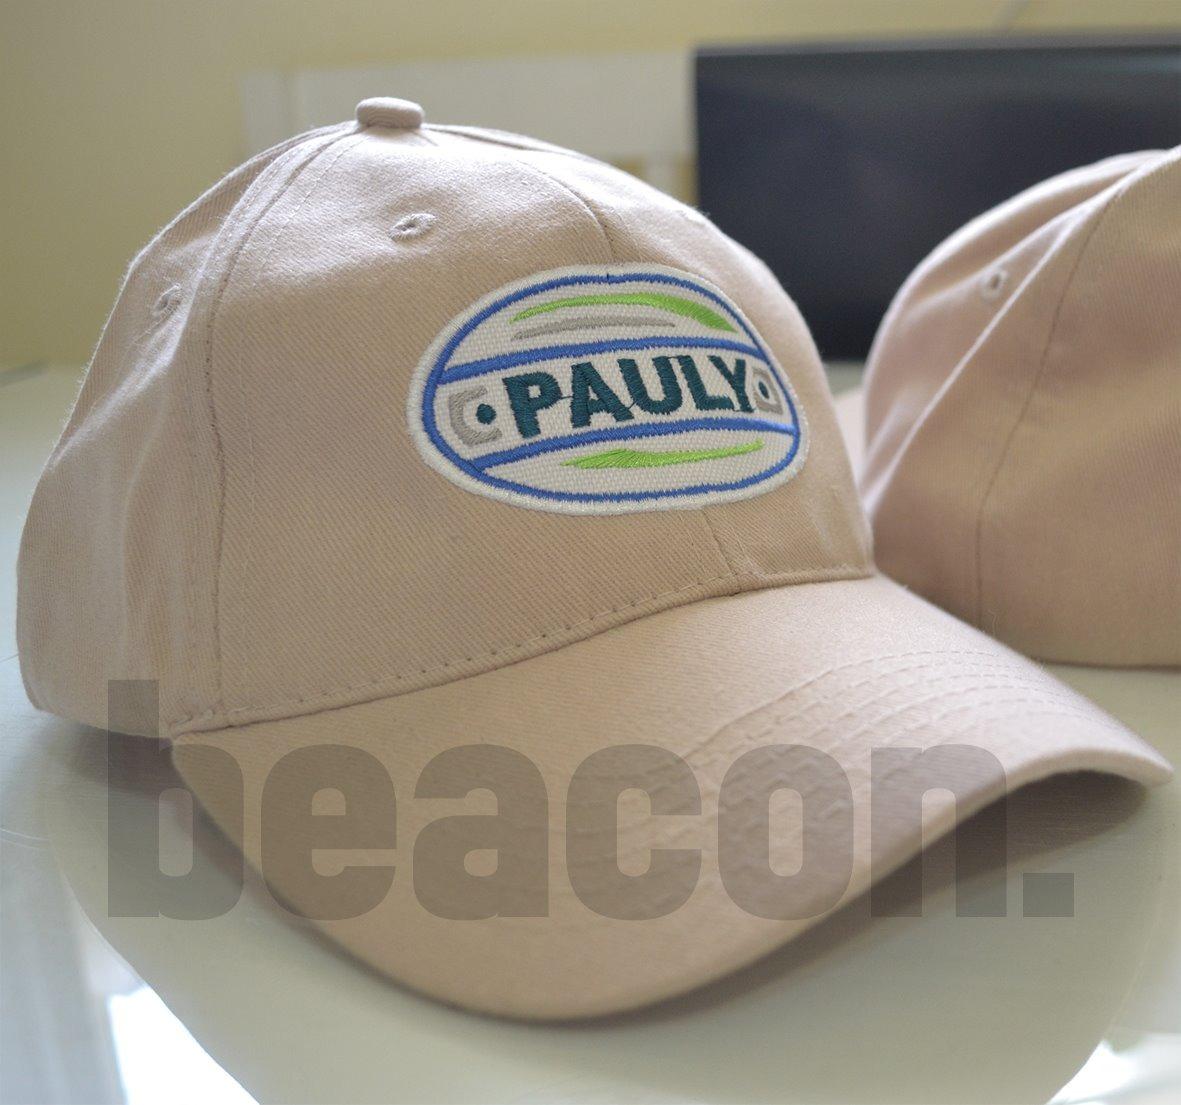 Gorros bordados personalizados eventos clubes precio cargando zoom jpg  1181x1105 Metalico gorras personalizadas bordadas e3faa99554d